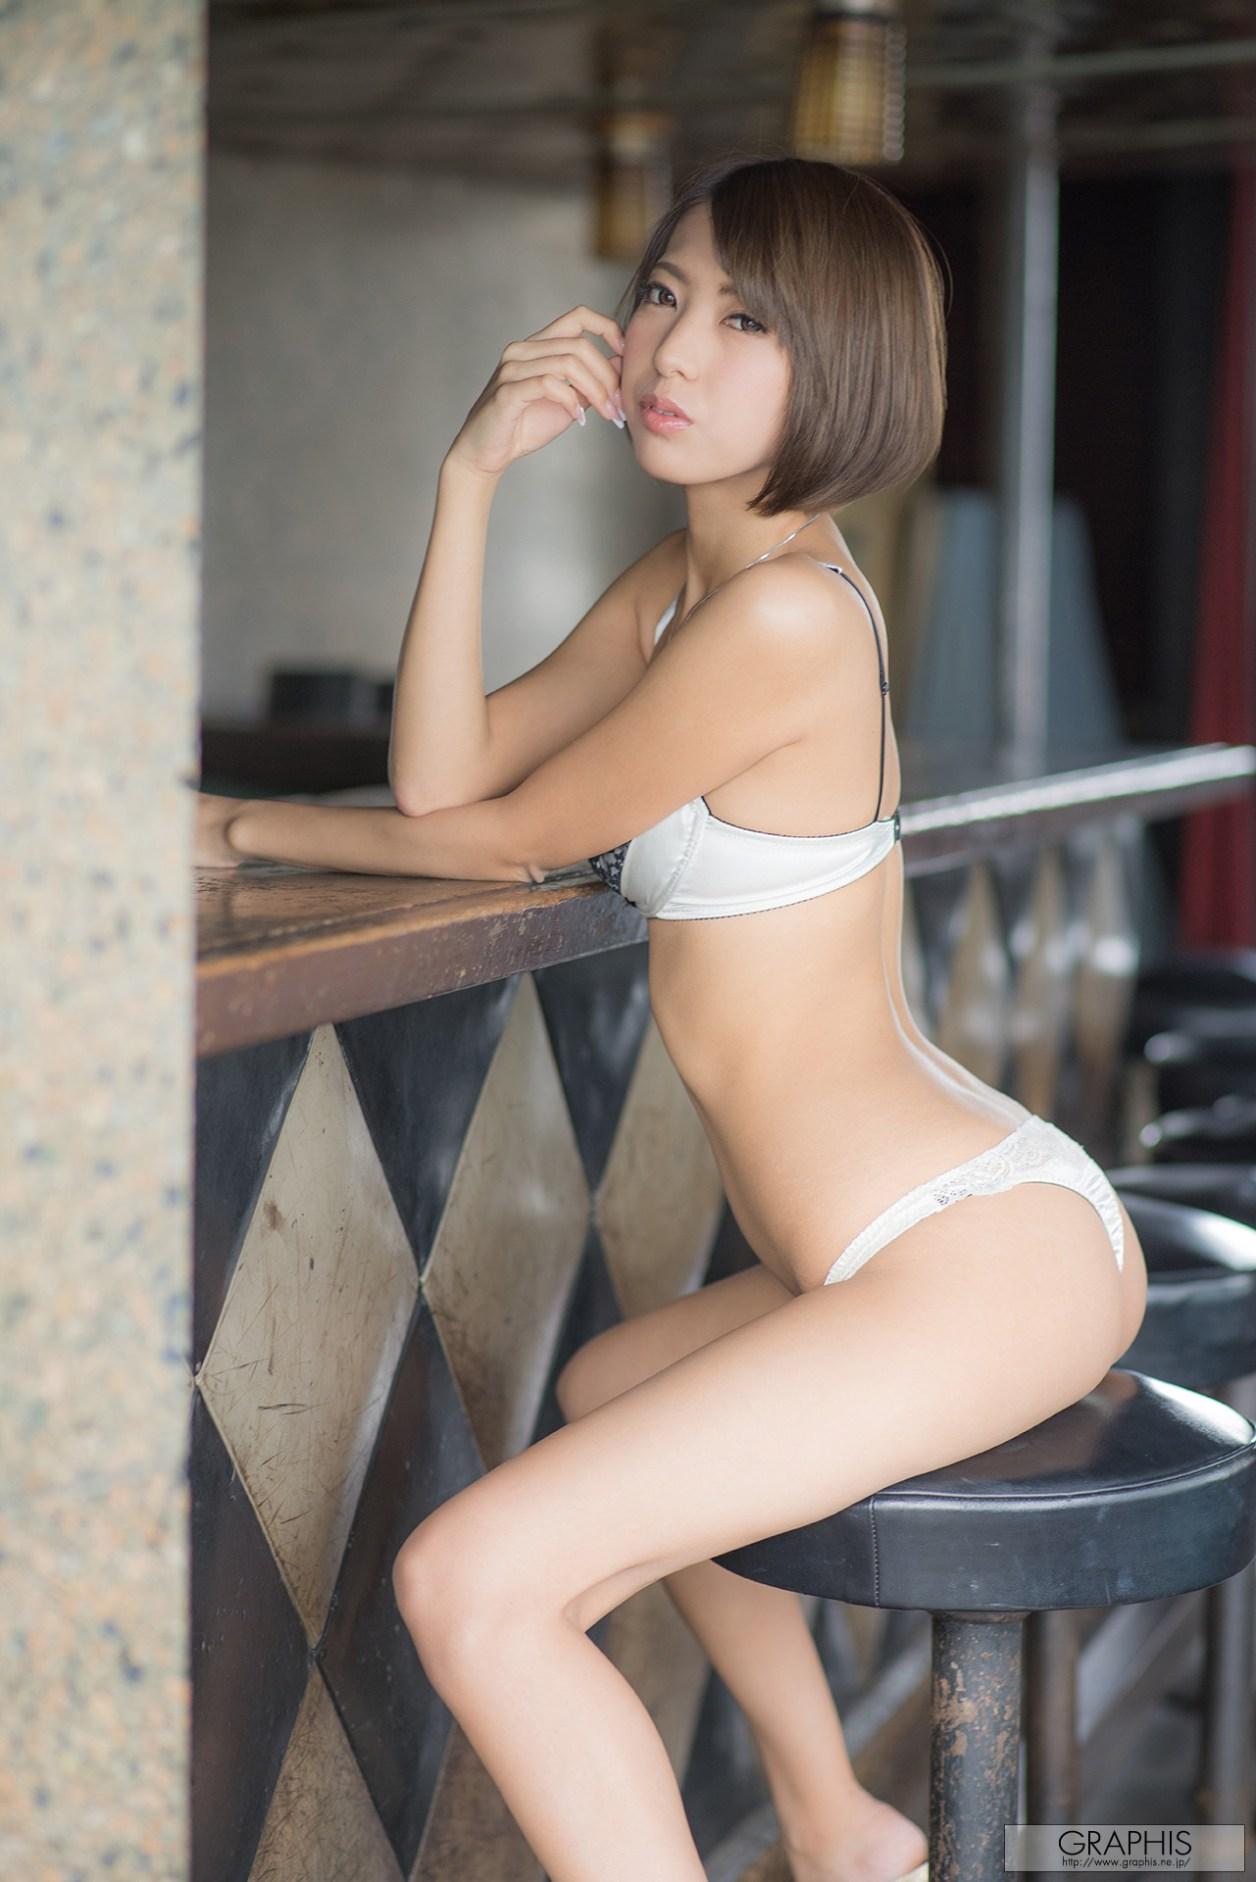 ryo-harusaki-daily007